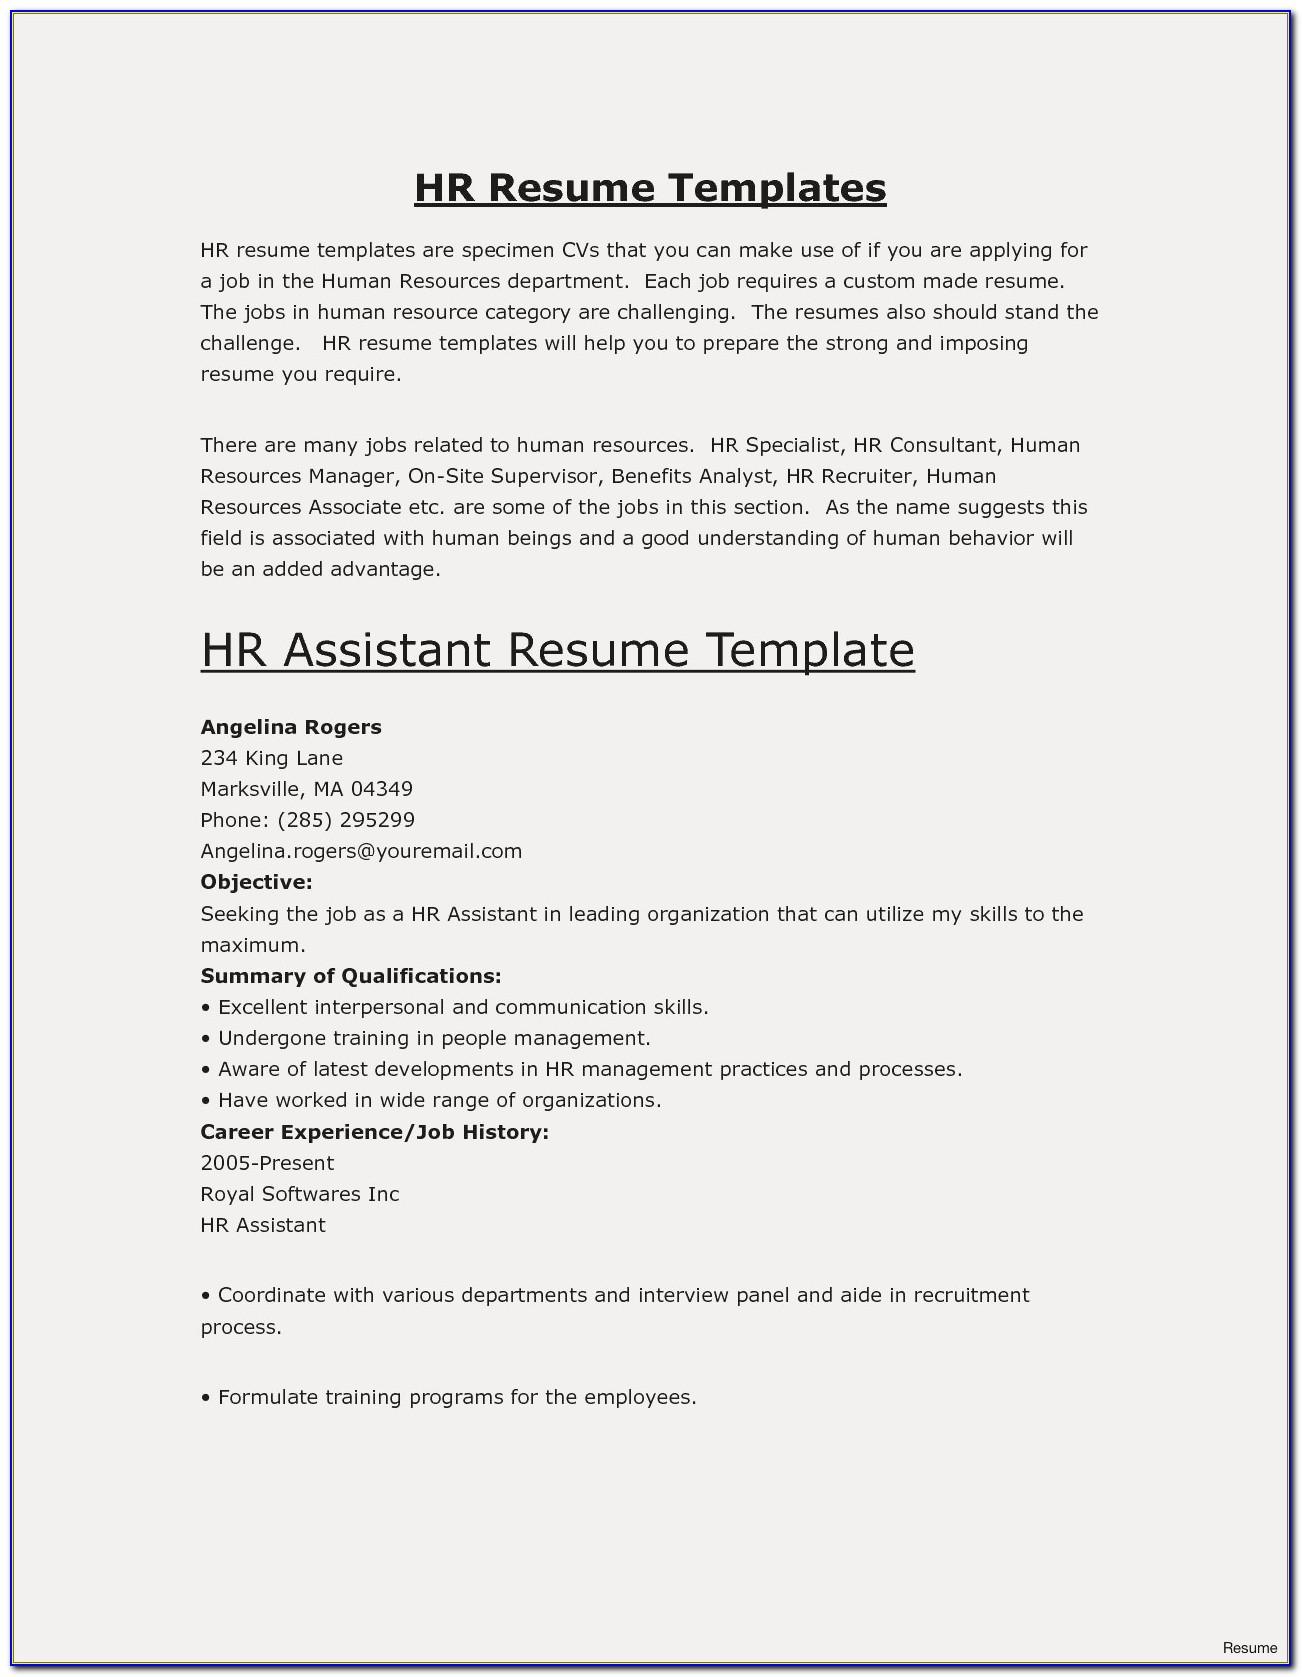 Engineering Resume Templa New Fresh Pr Resume Template Elegant Resume Example For Freshers Engineers